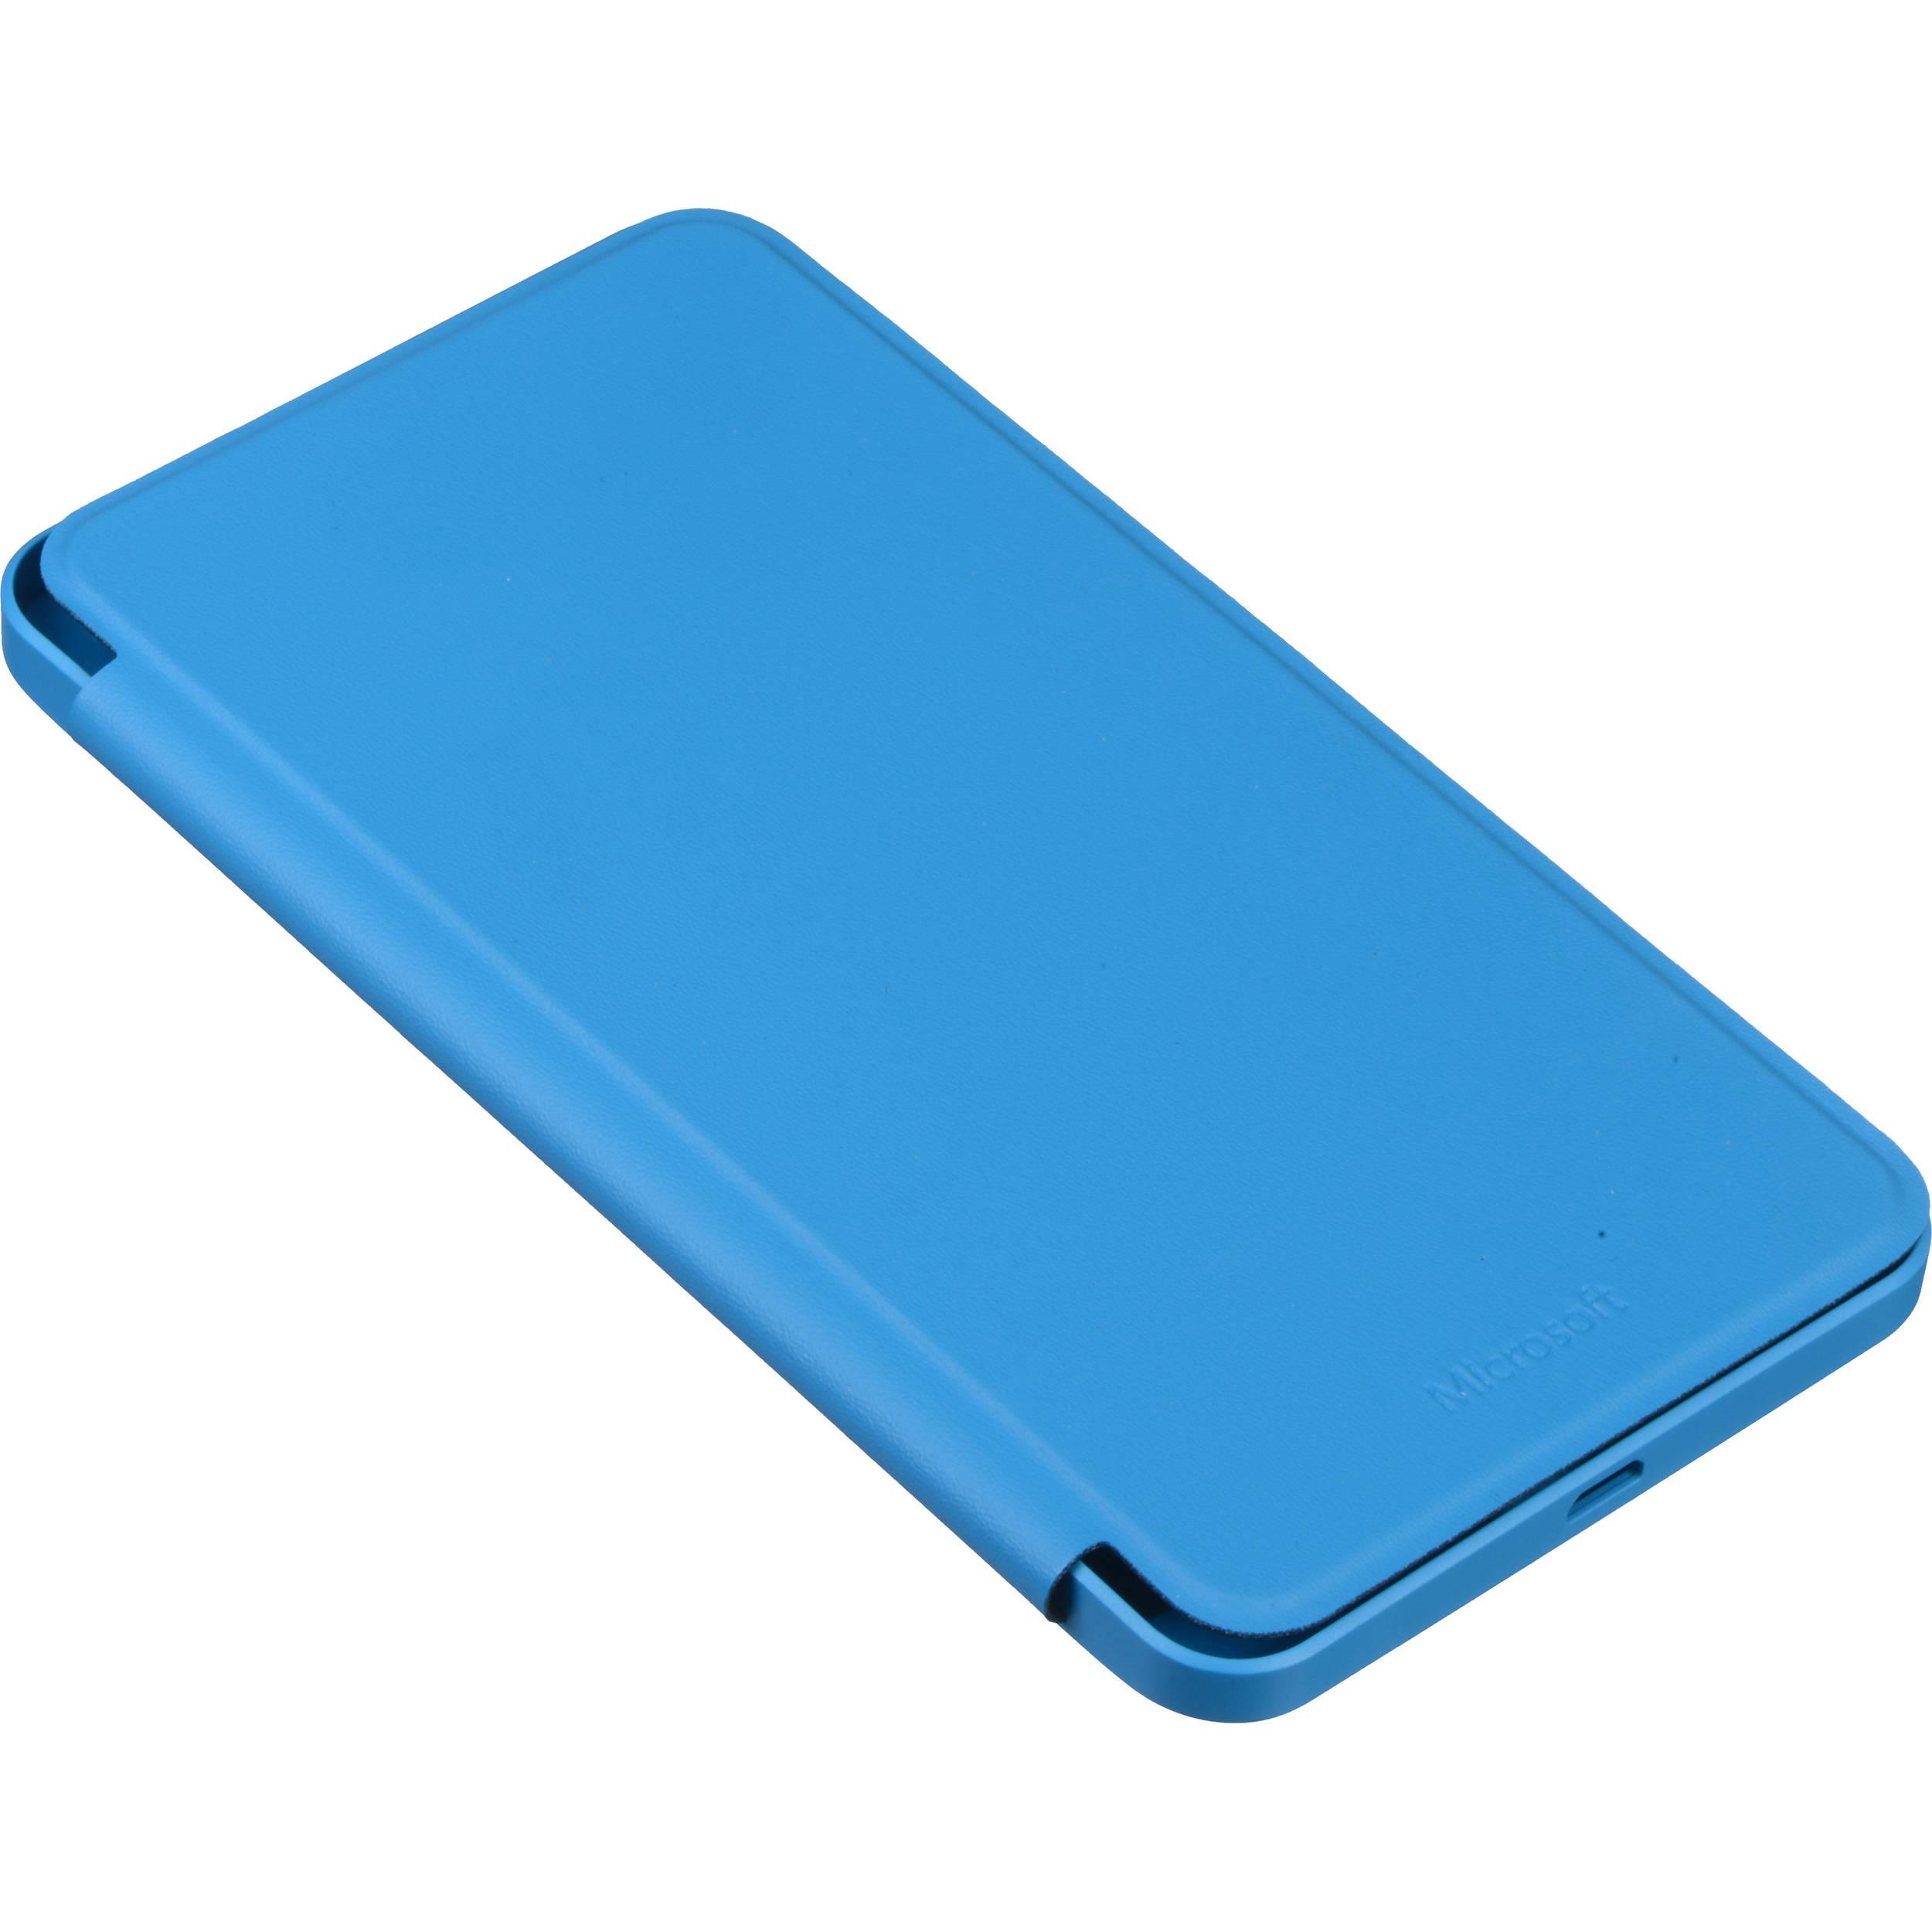 low priced a19e2 06b27 Microsoft Flip Cover Case for Lumia 640 XL (Cyan)